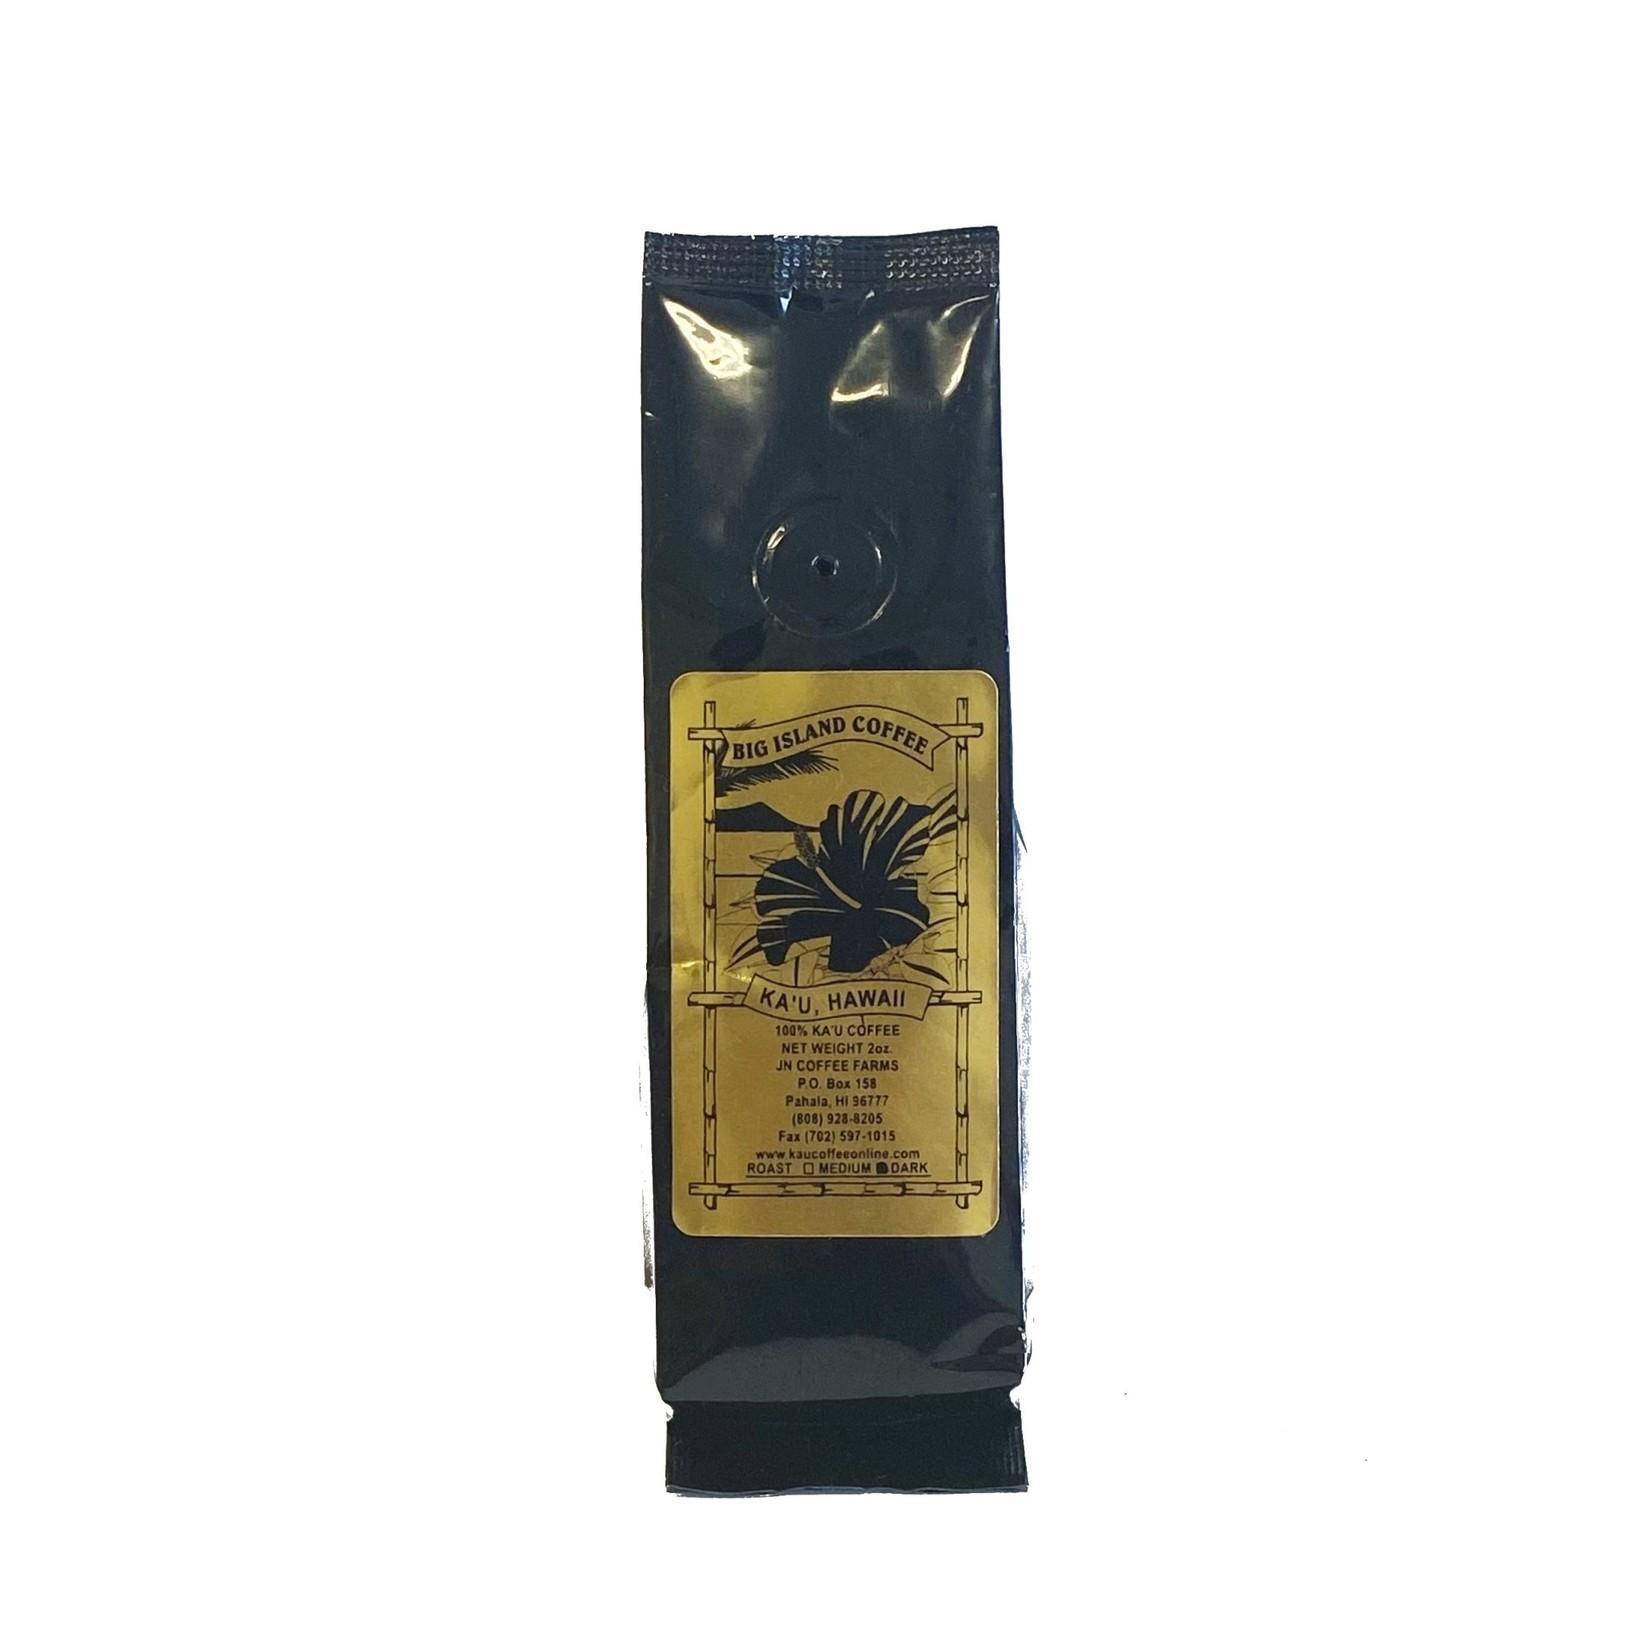 JN Coffee Farms Big Island 100% Kau Coffee